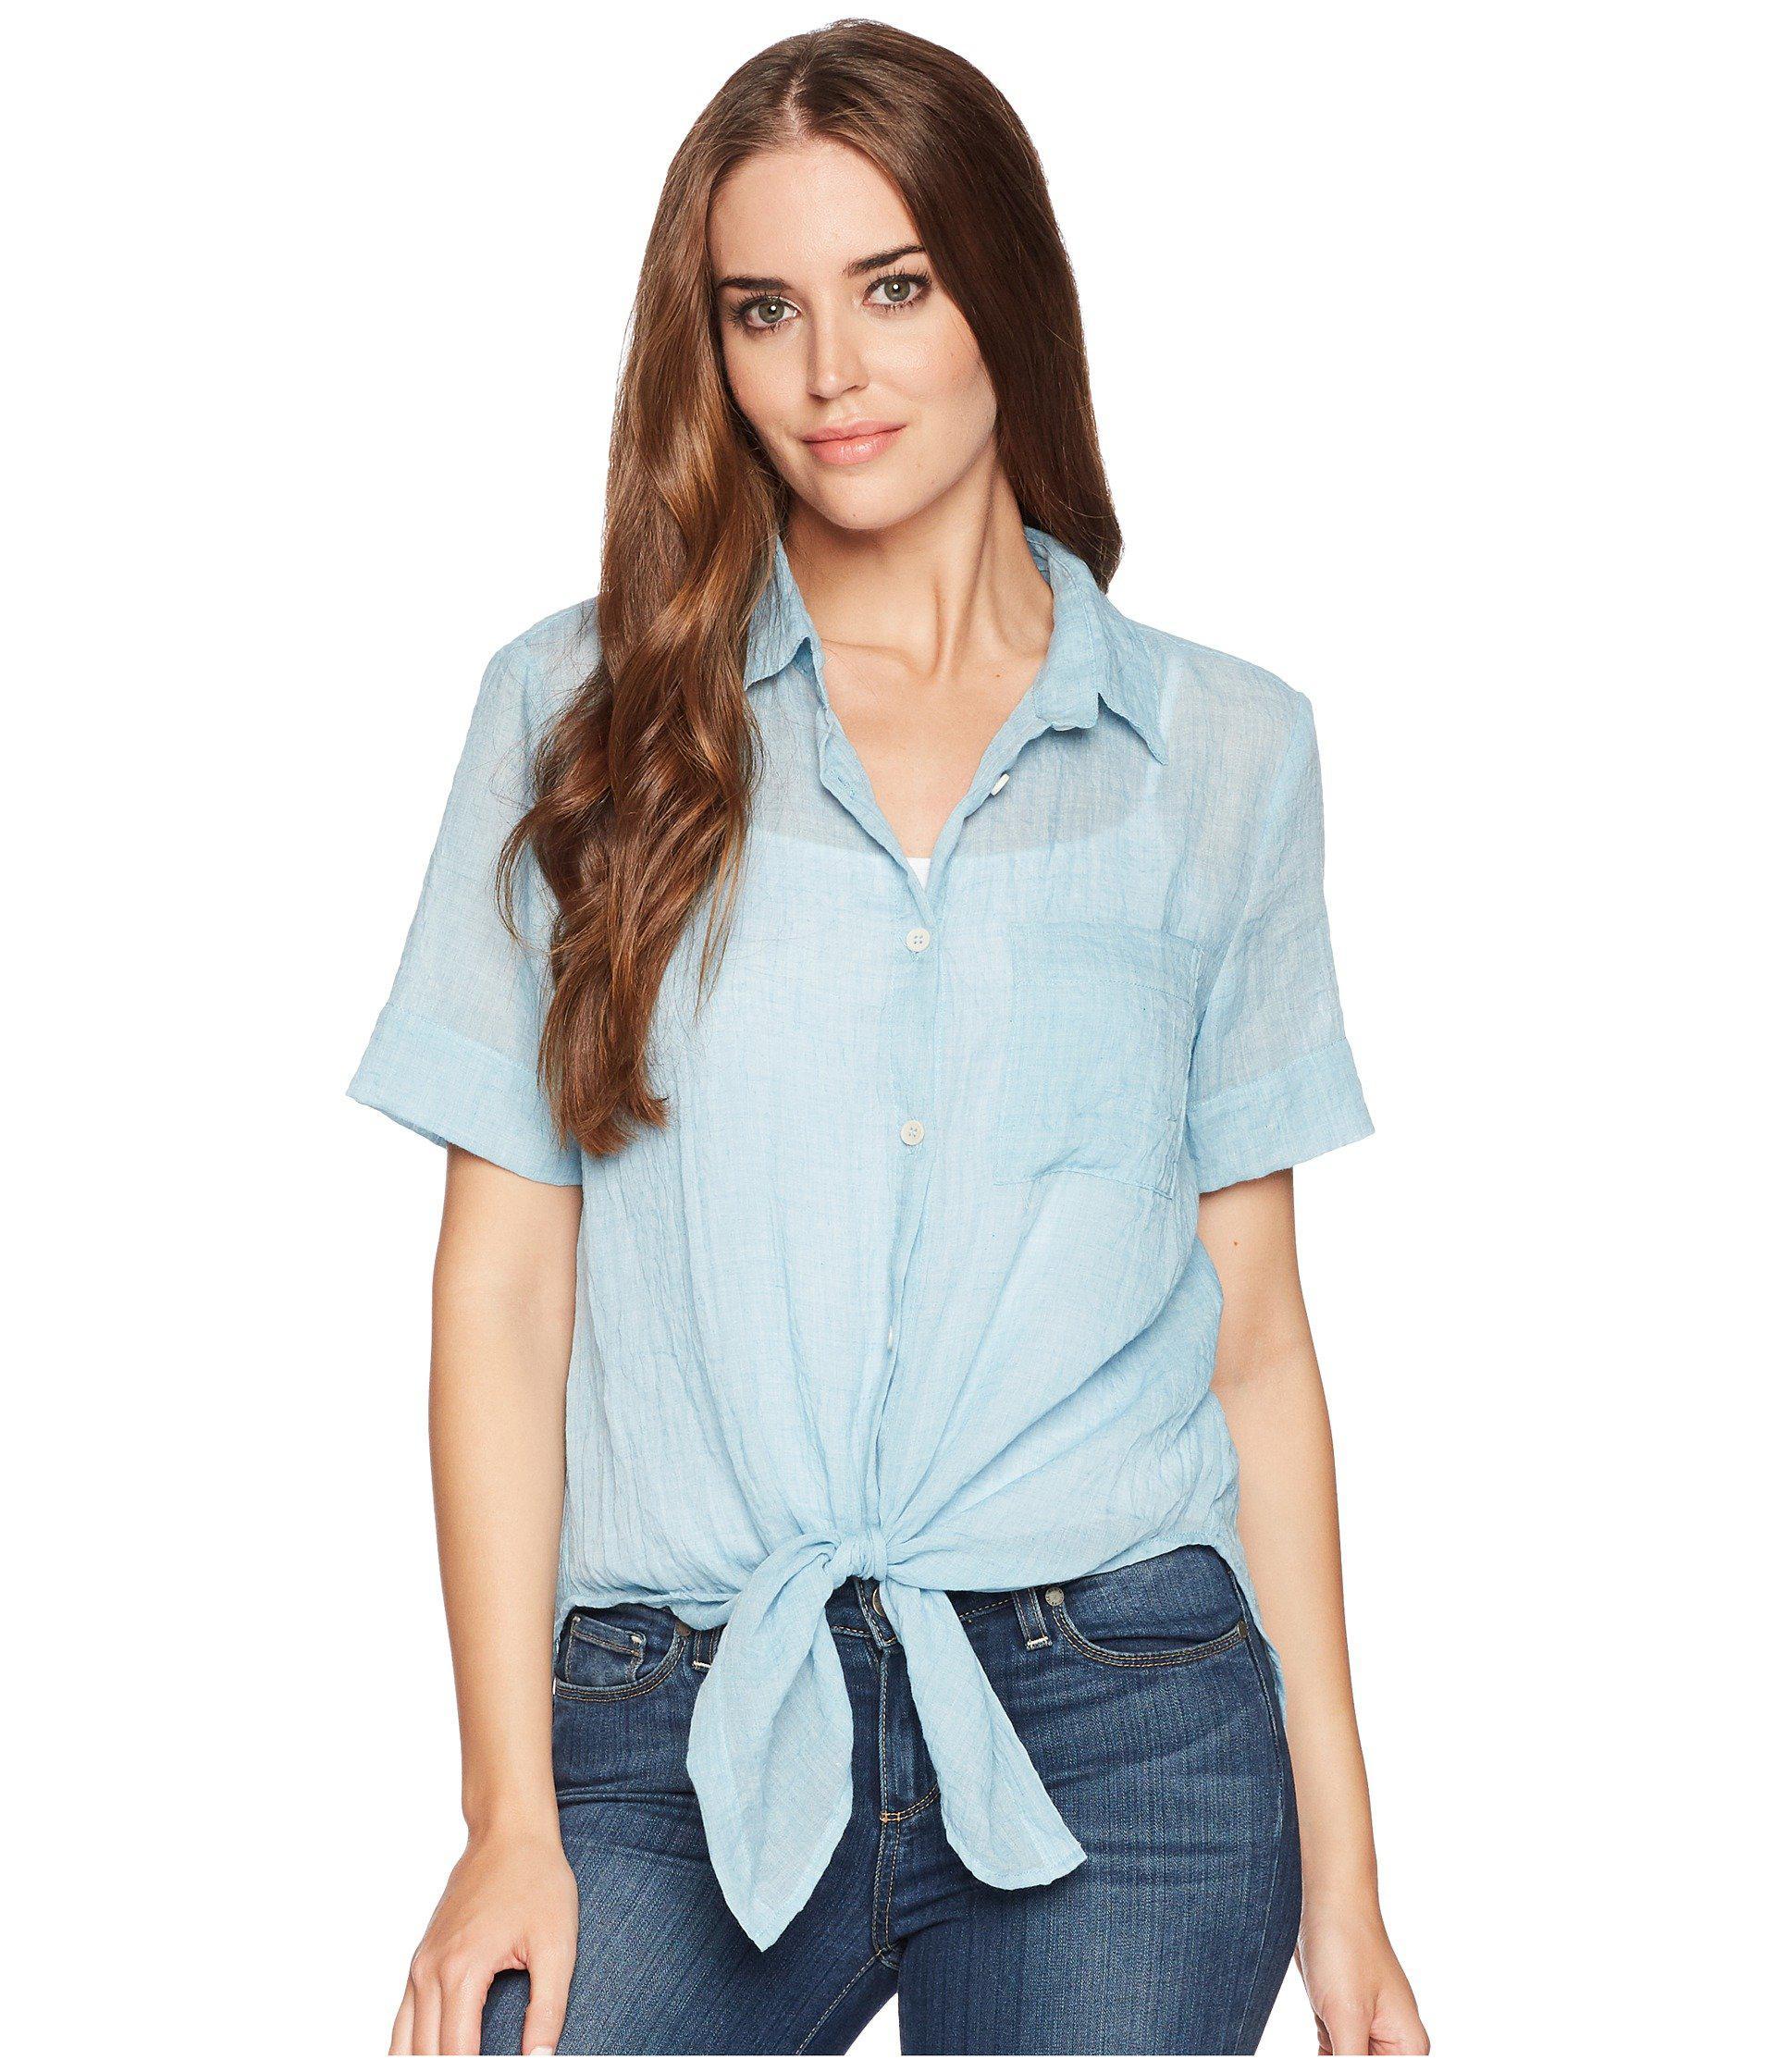 d1c1da94 Amazon.com: mens short sleeve dress shirts with tie